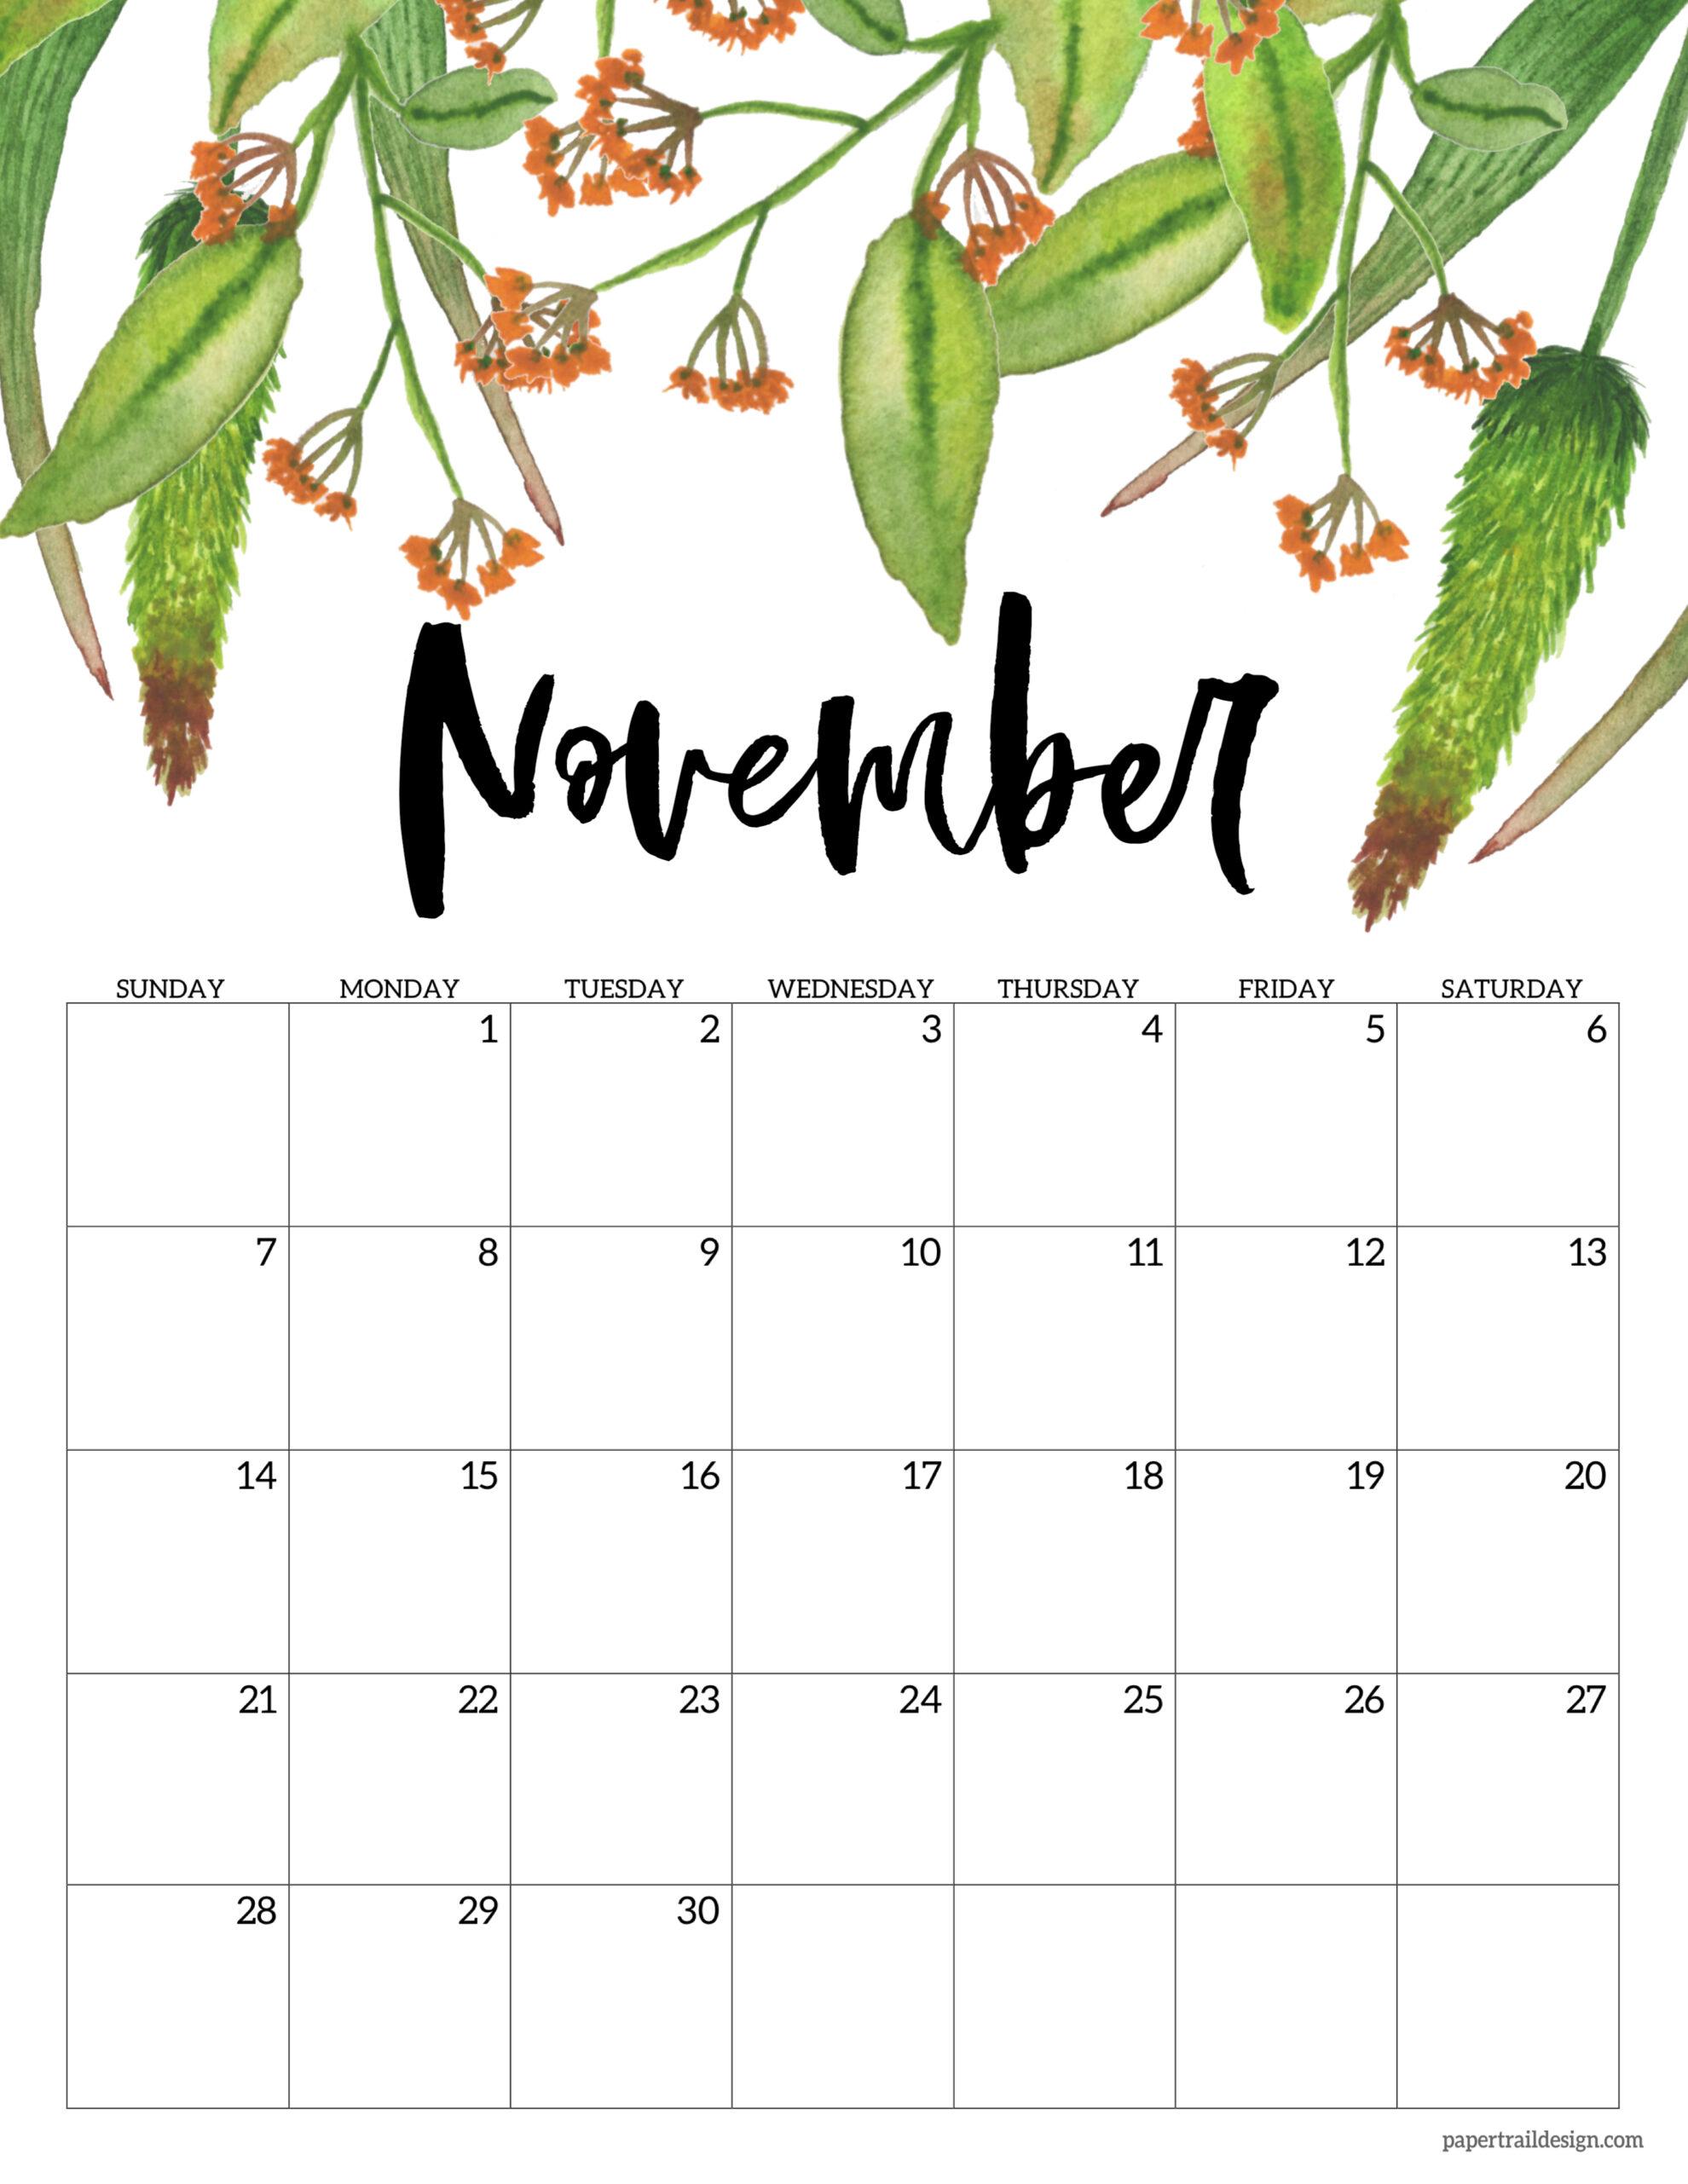 Cute November 2021 Calendar Free Printable 2021 Floral Calendar | Paper Trail Design